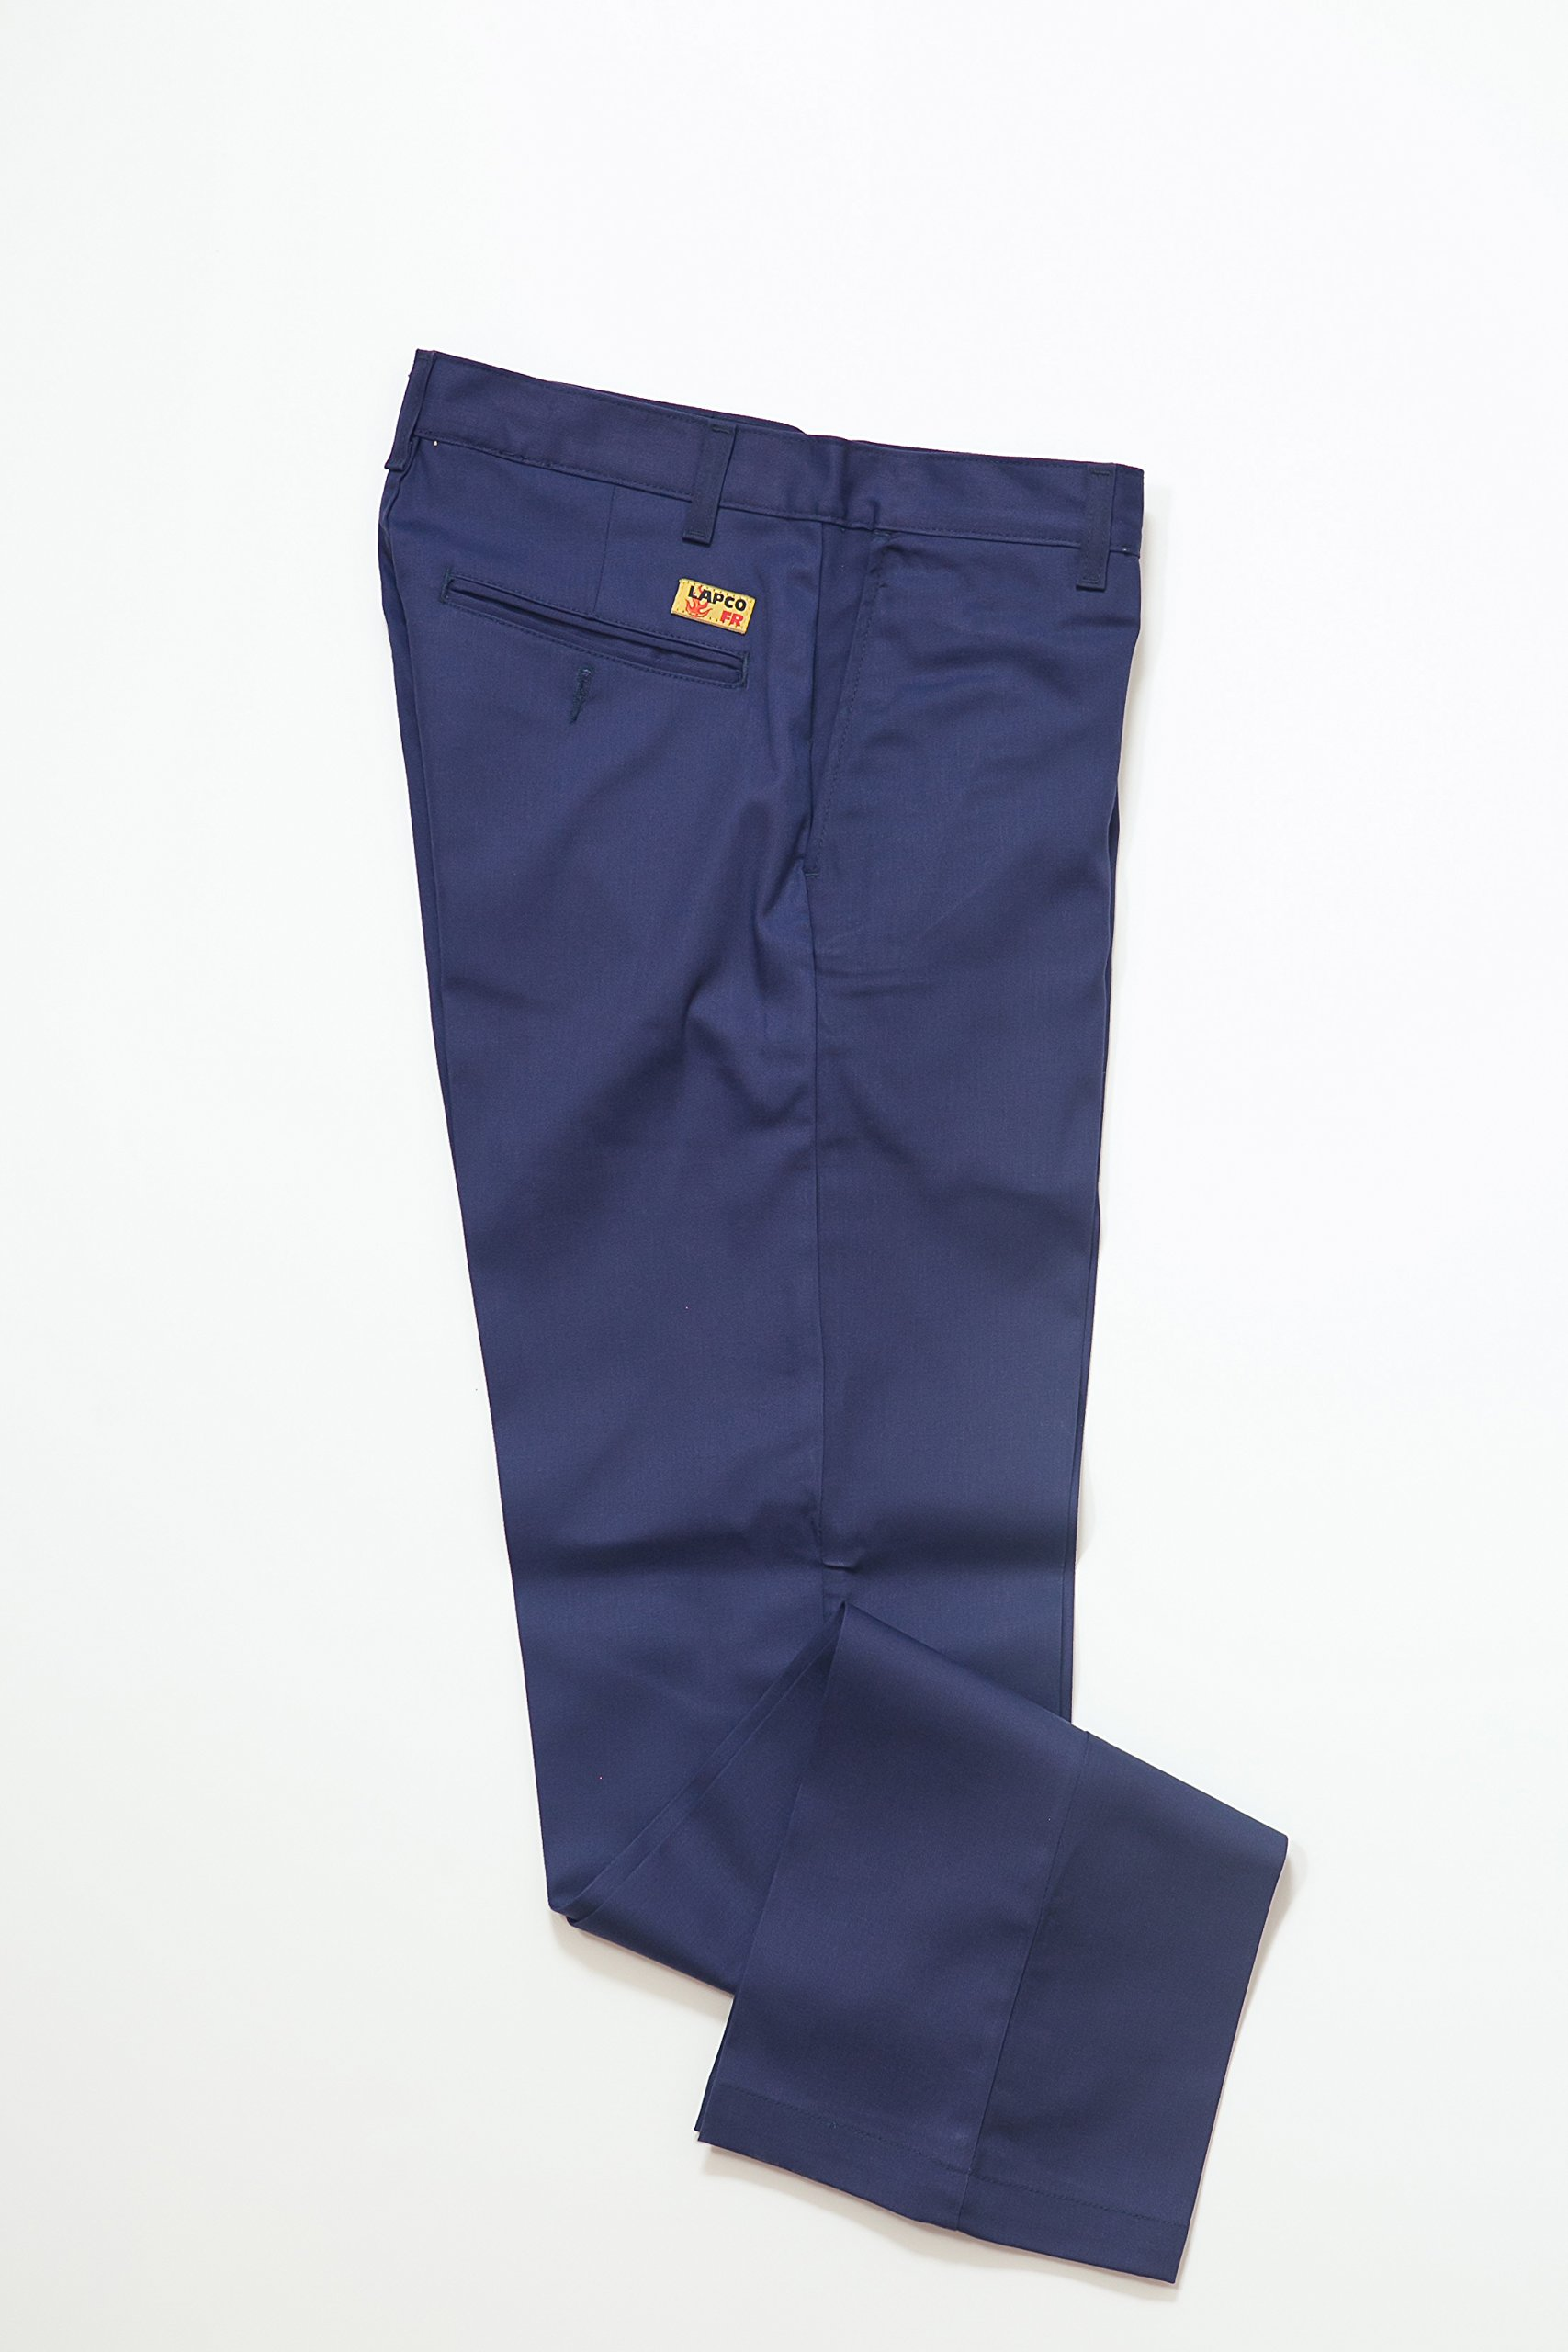 Lapco FR P-INNAC 34X30 Advanced Comfort Uniform Pants, 34'' x 30'', Navy